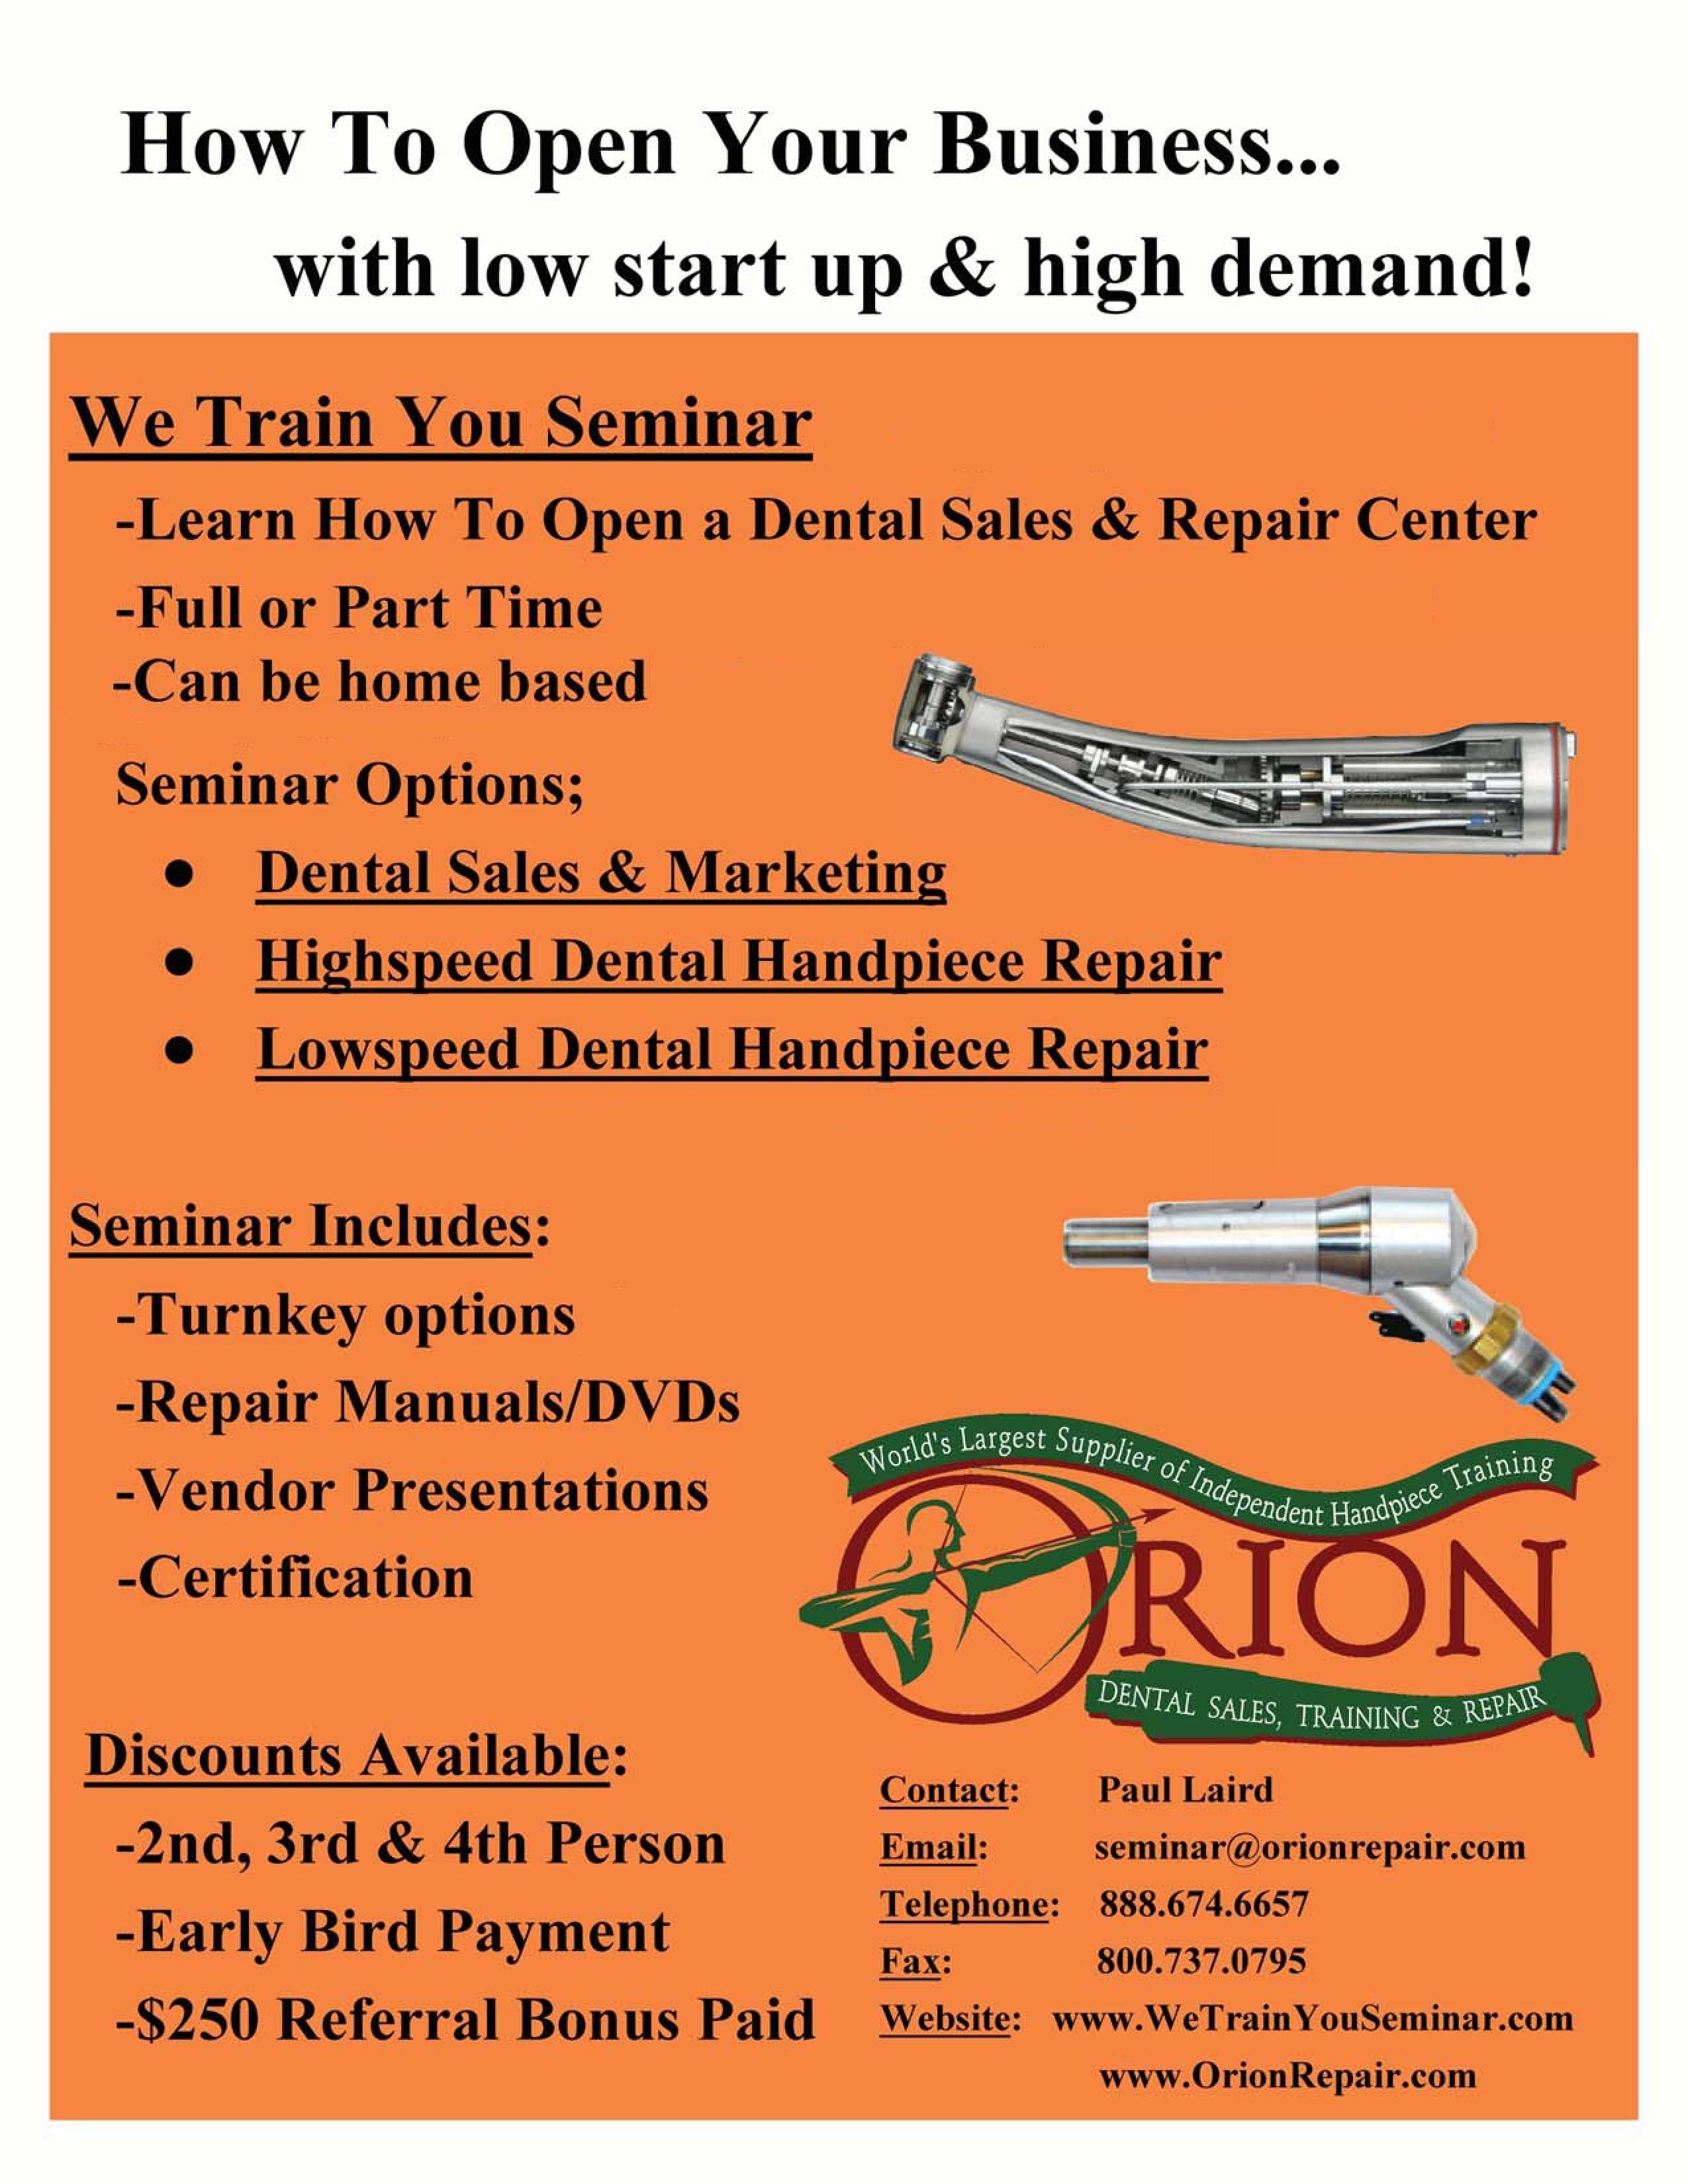 orion-seminars.jpg